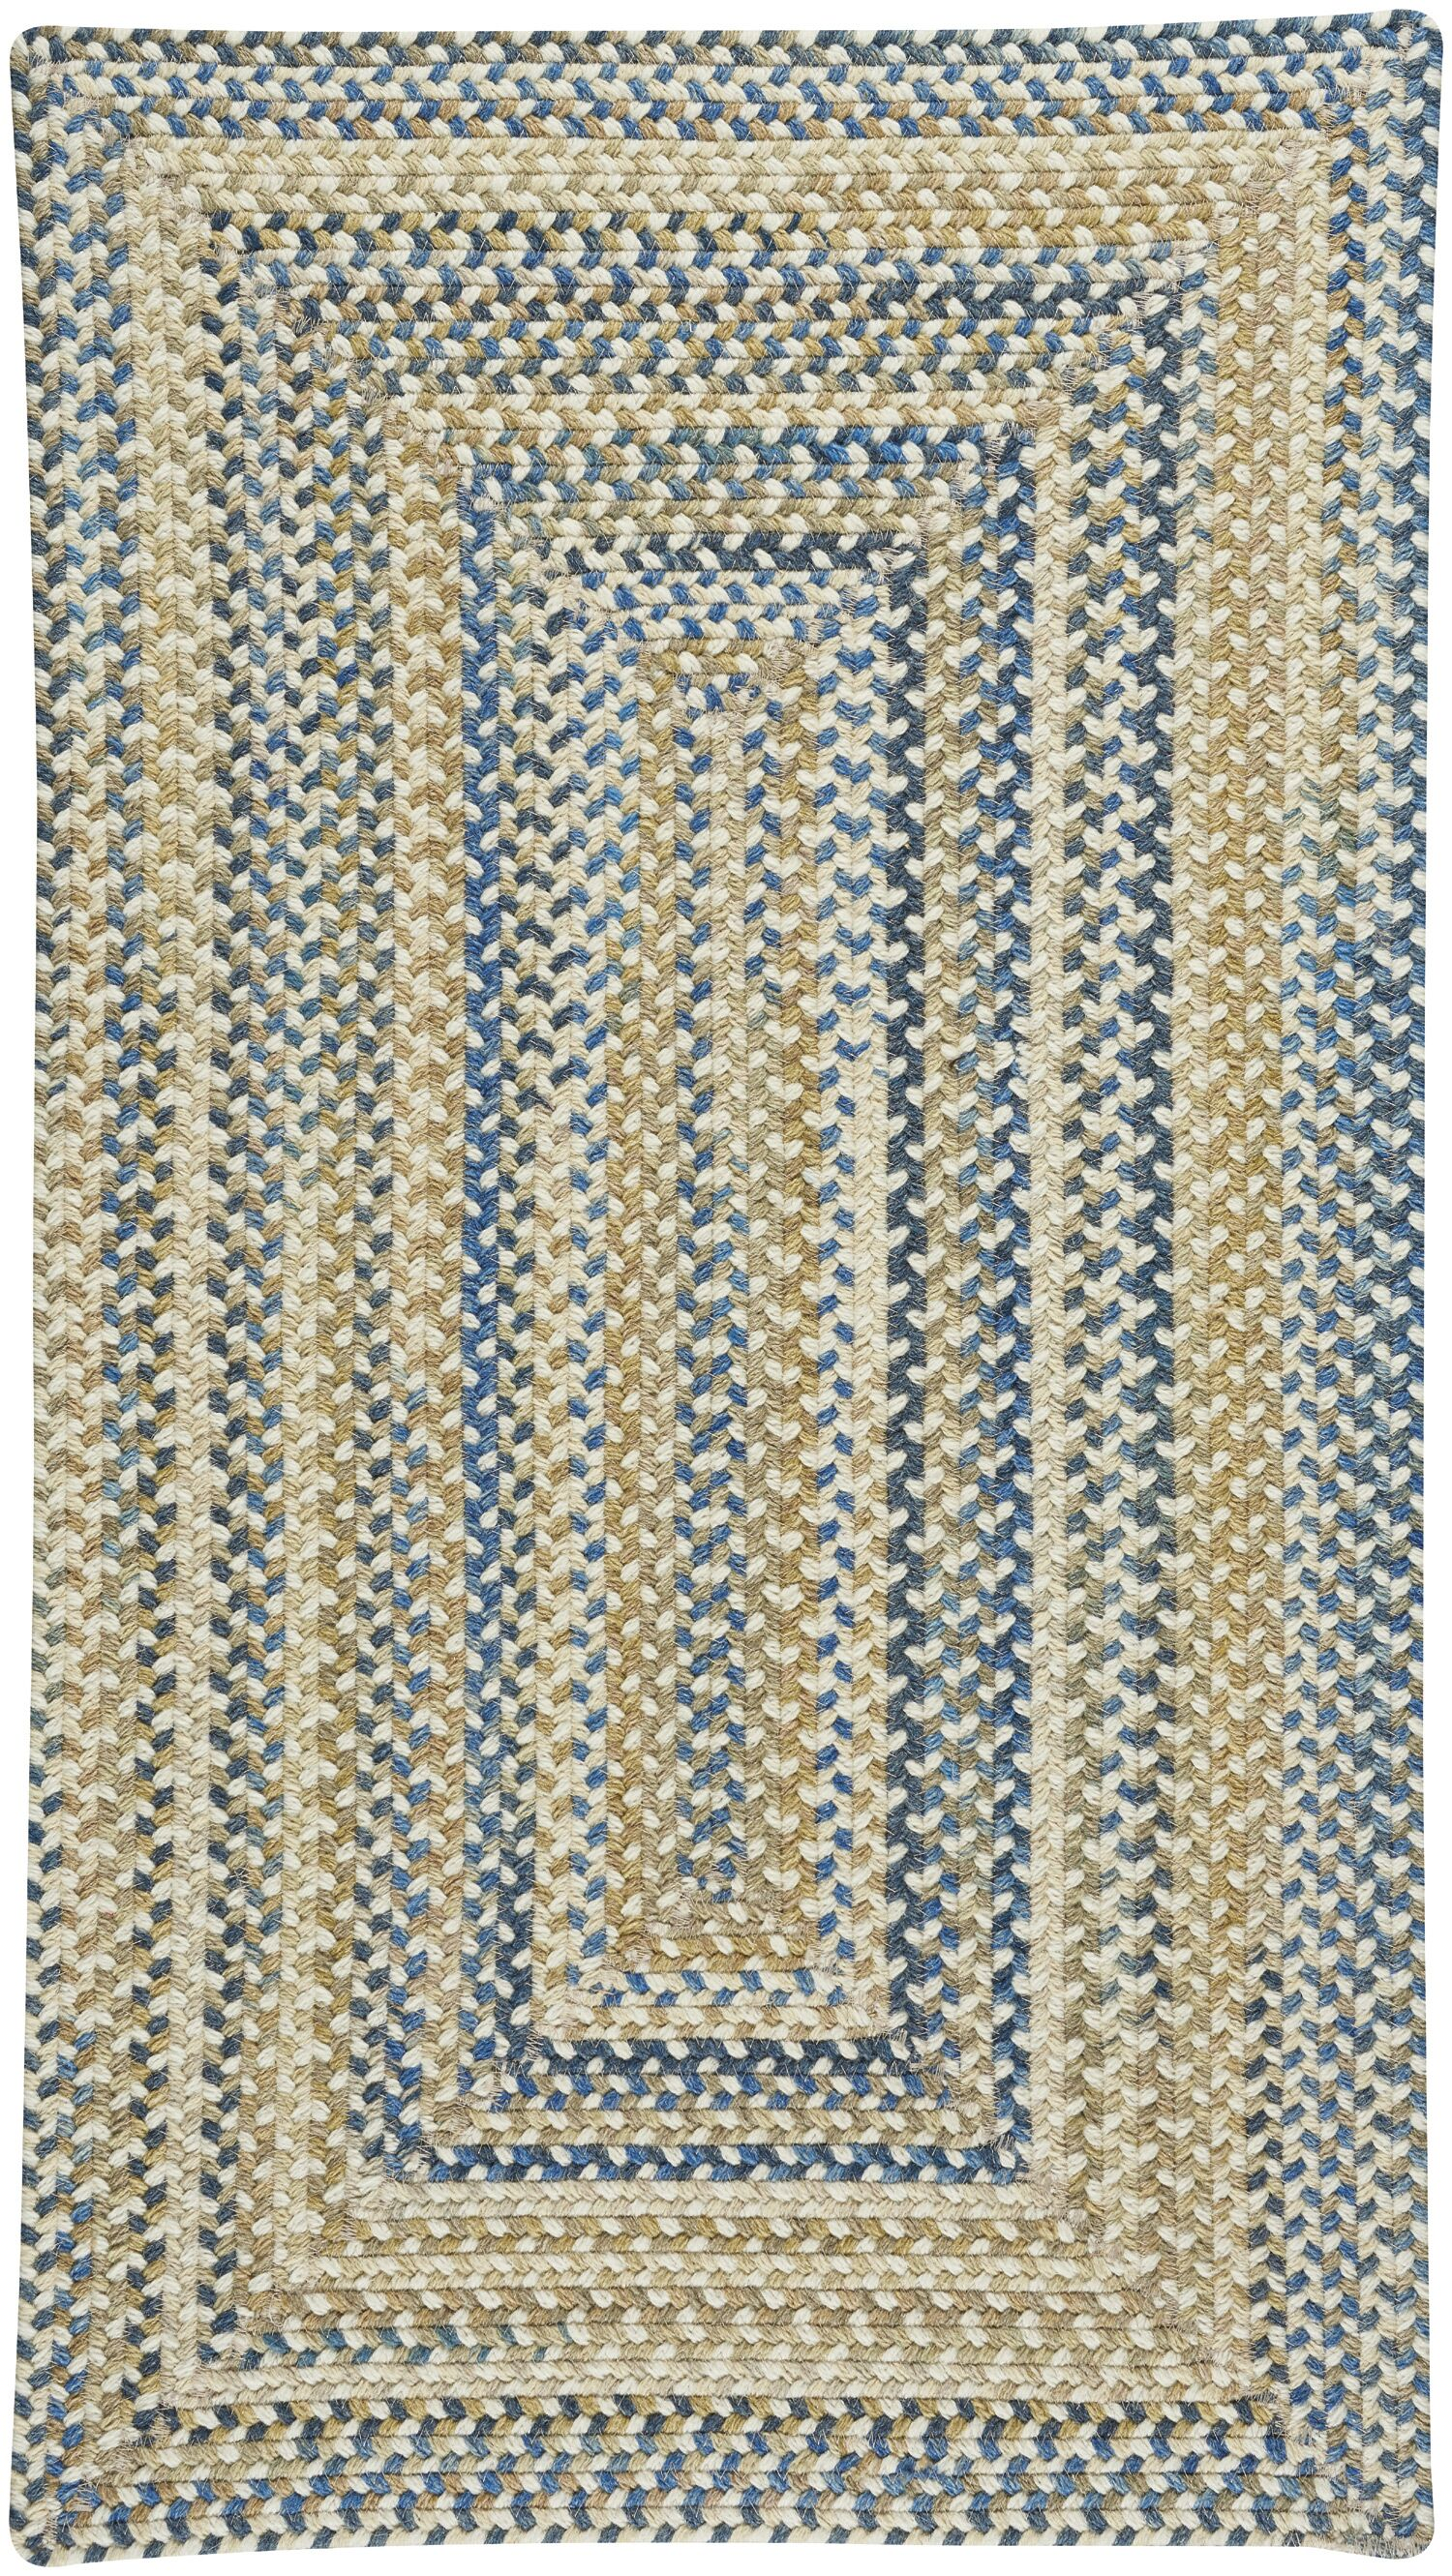 Myrtille Light Tan Area Rug Rug Size: Rectangle 4' x 6'